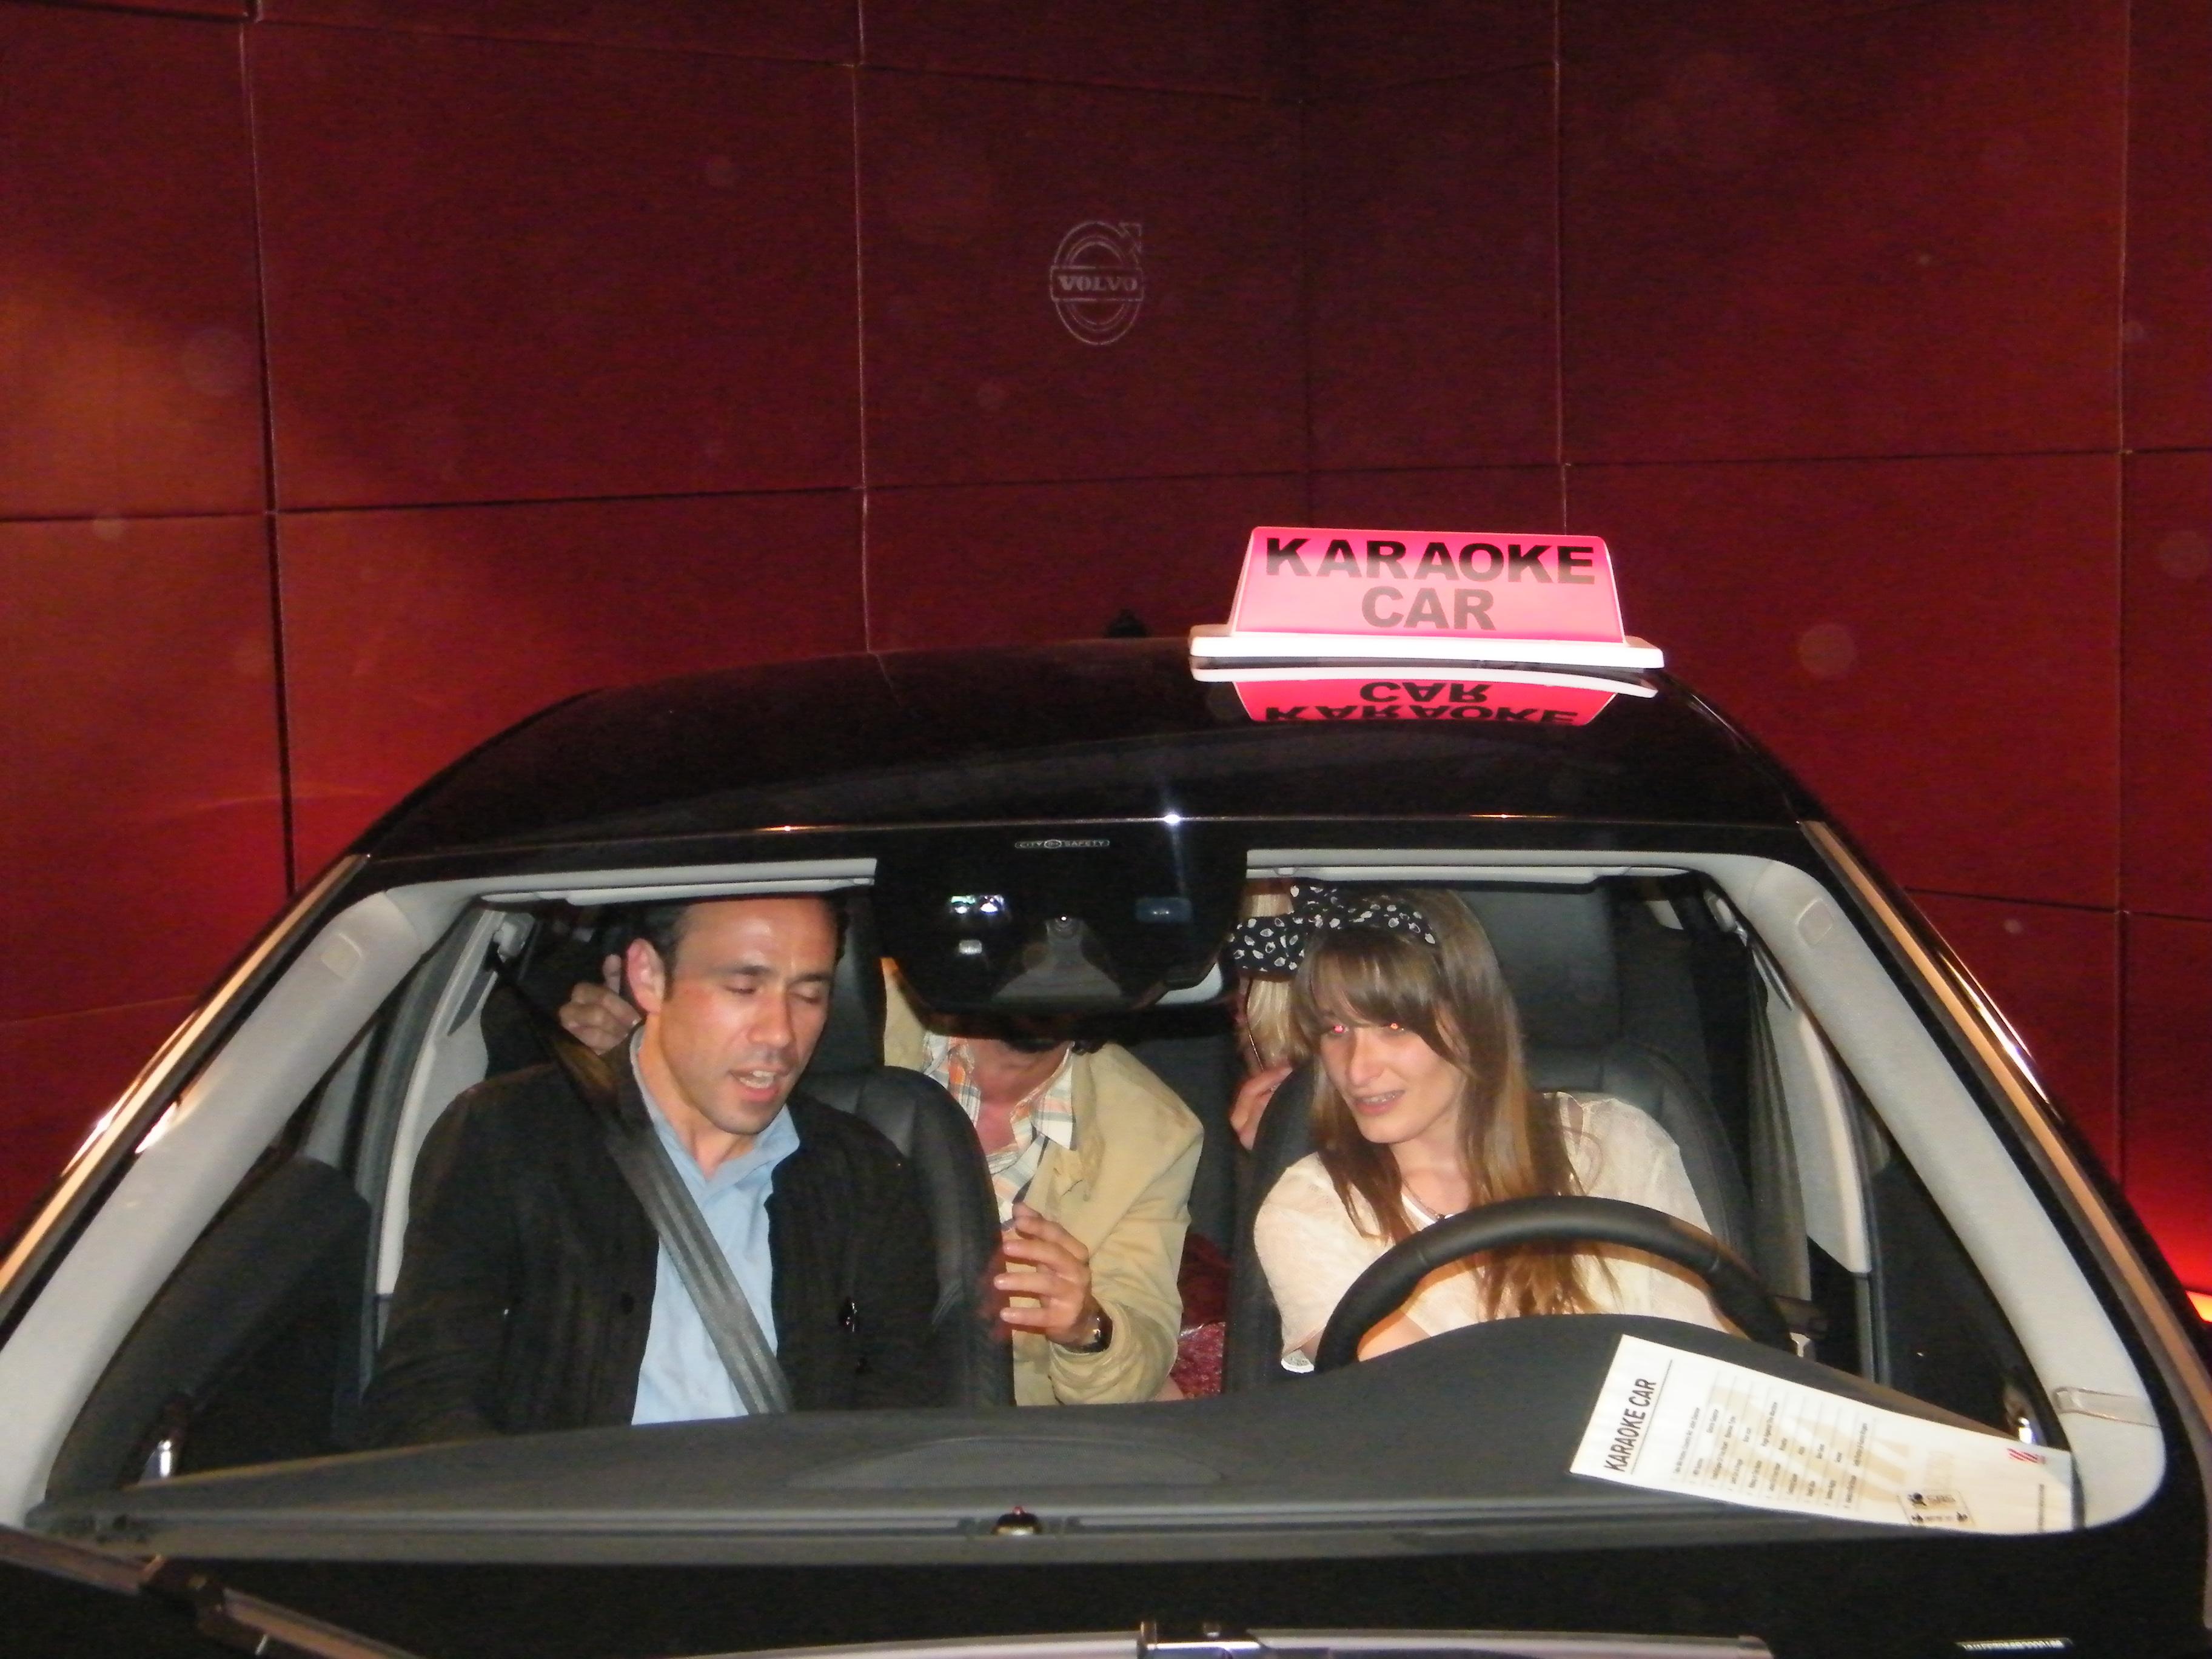 karaoke car volvo s60 paris